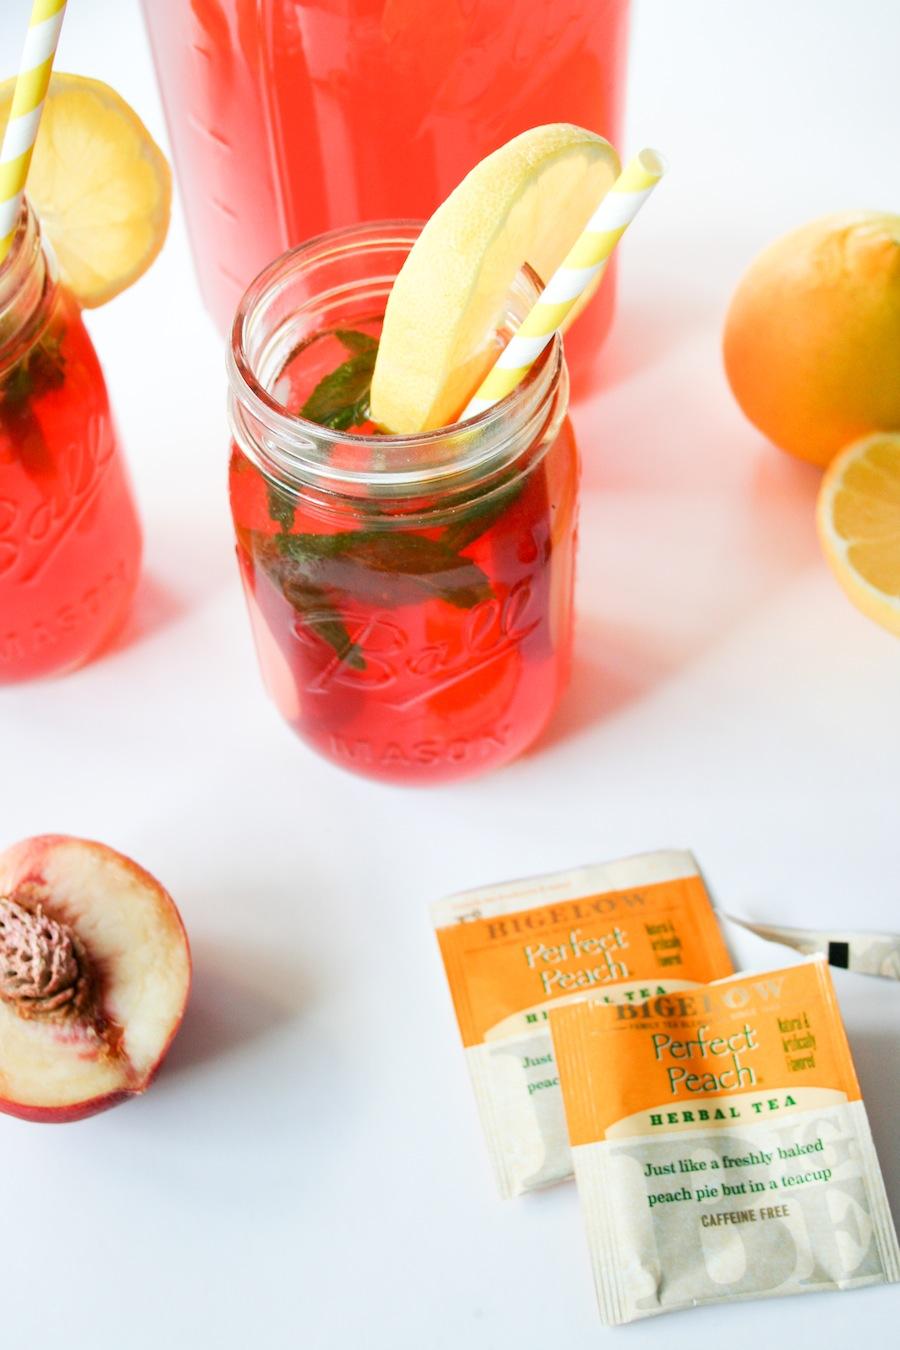 Porch-Peach-Iced-Tea-Recipe-Legal-Miss-Sunshine-23 copy